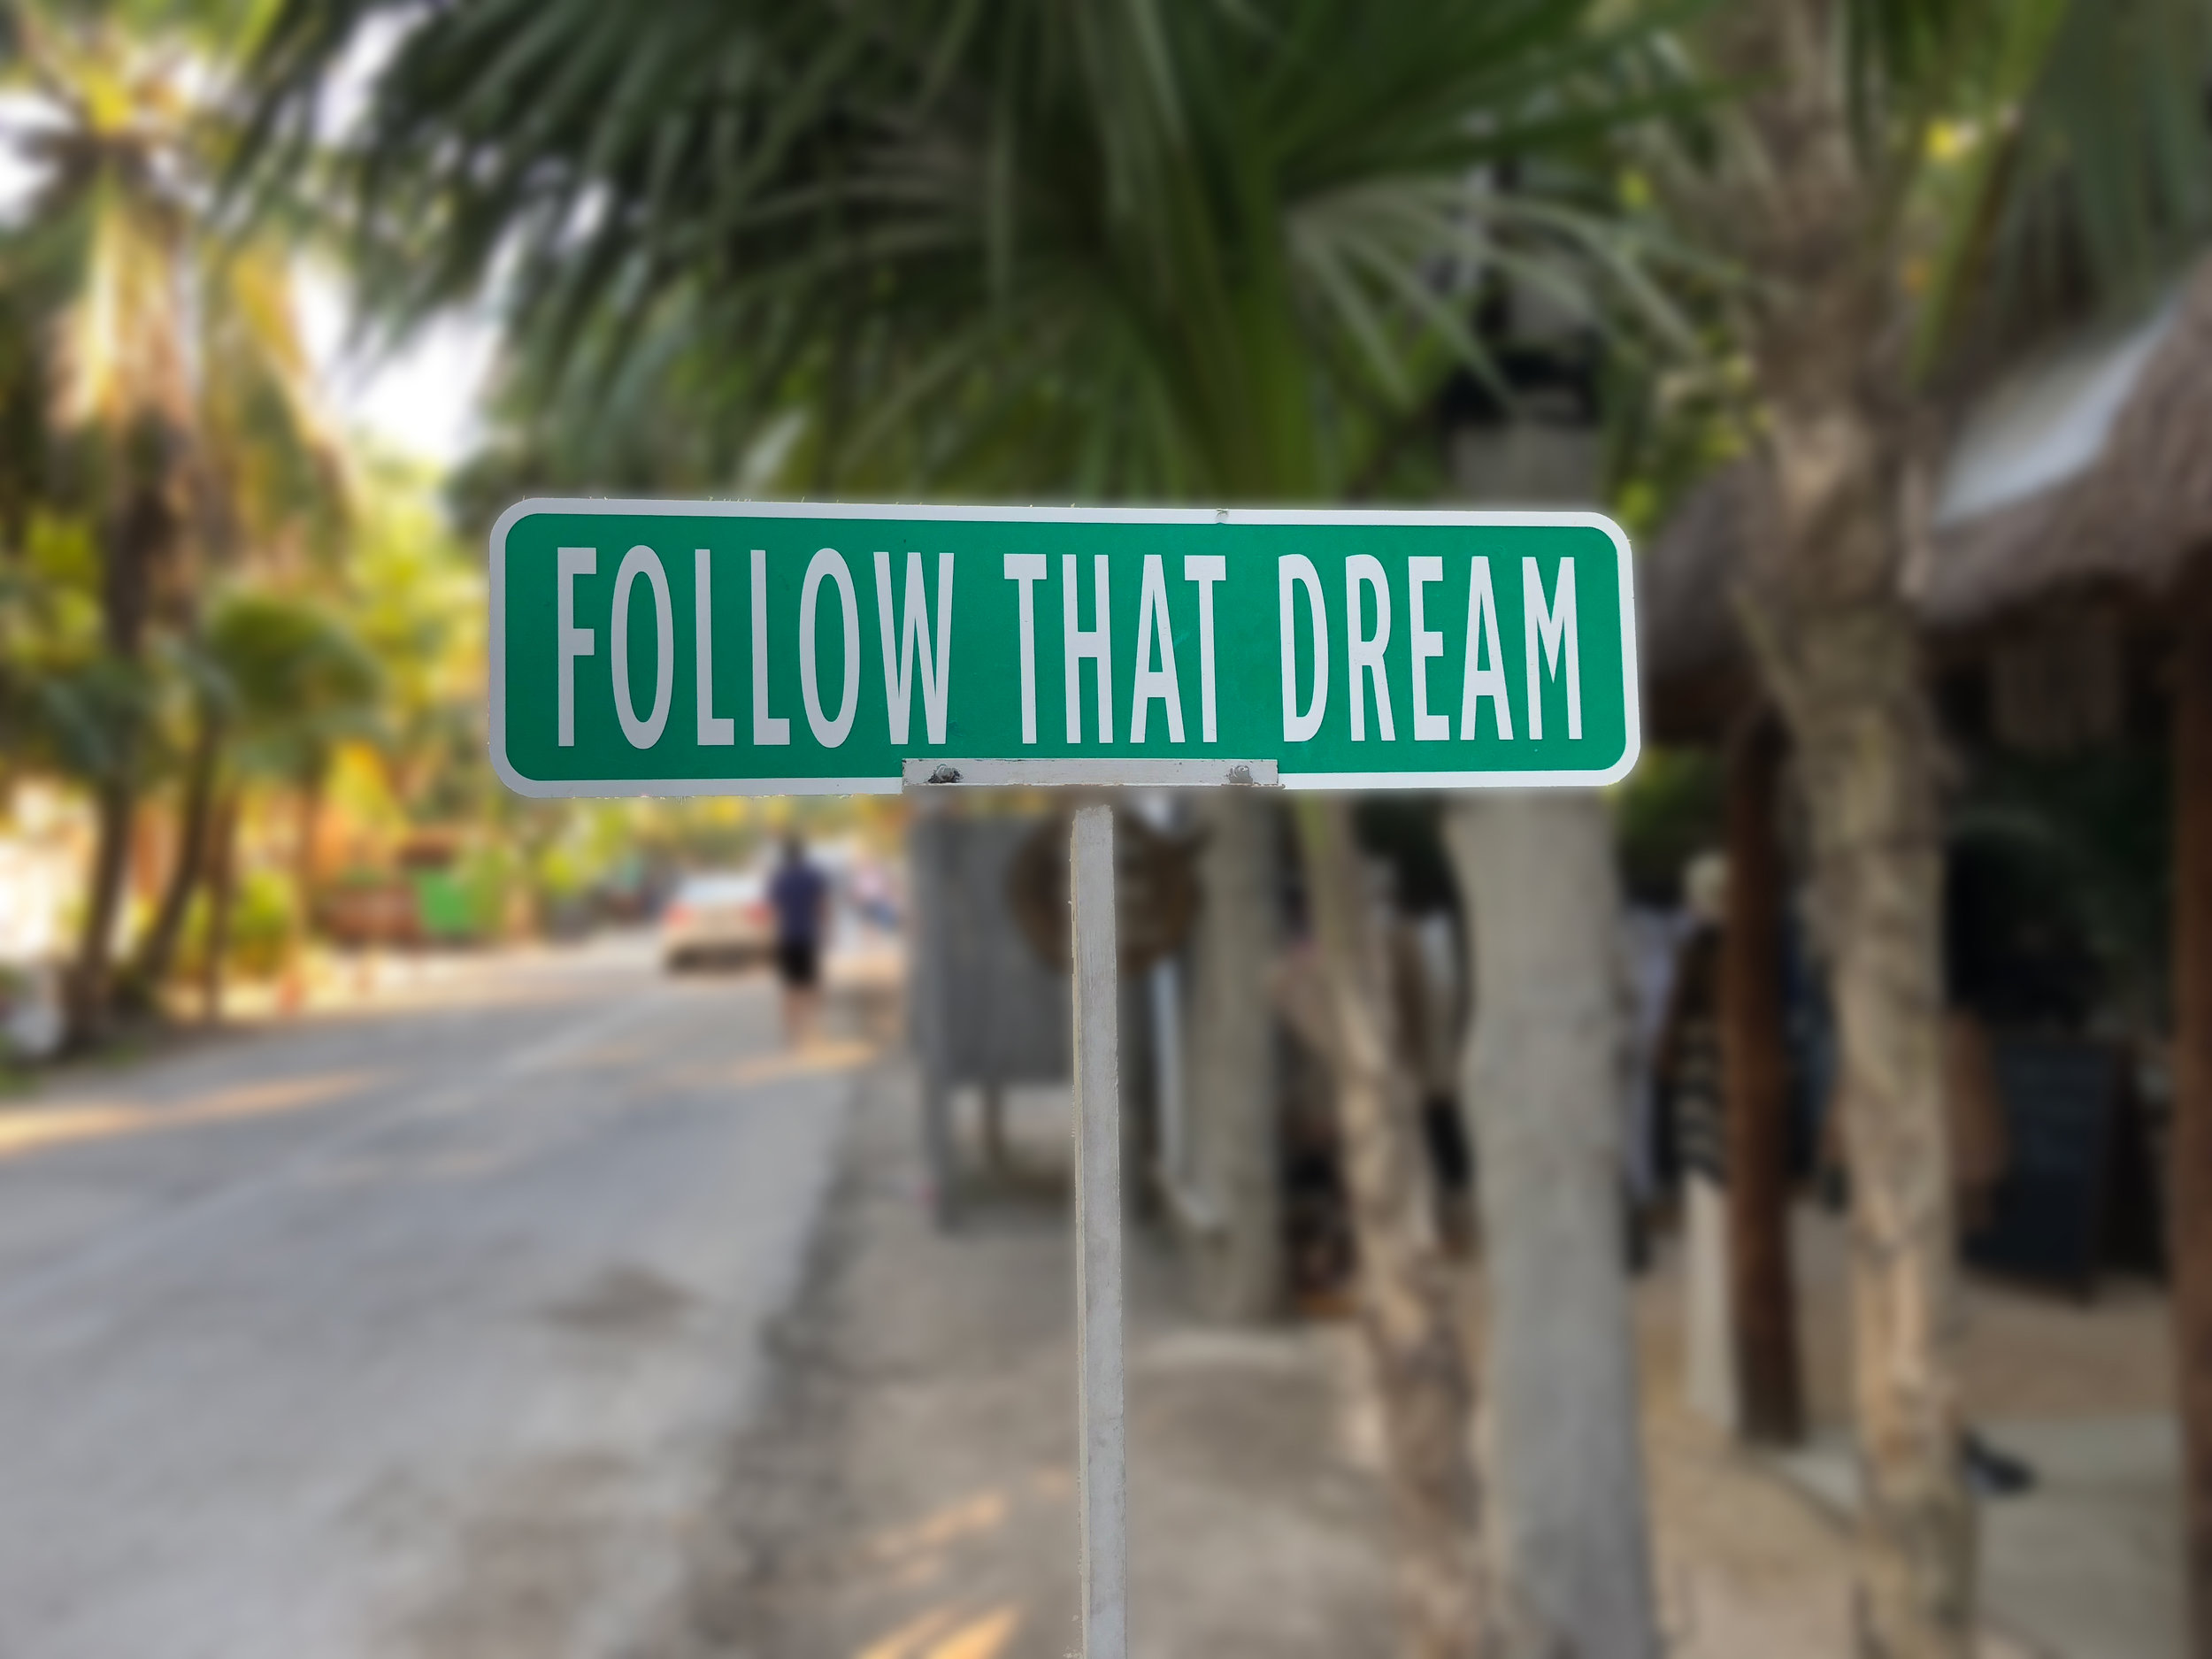 Follow_that_dream_BlurREV.jpg